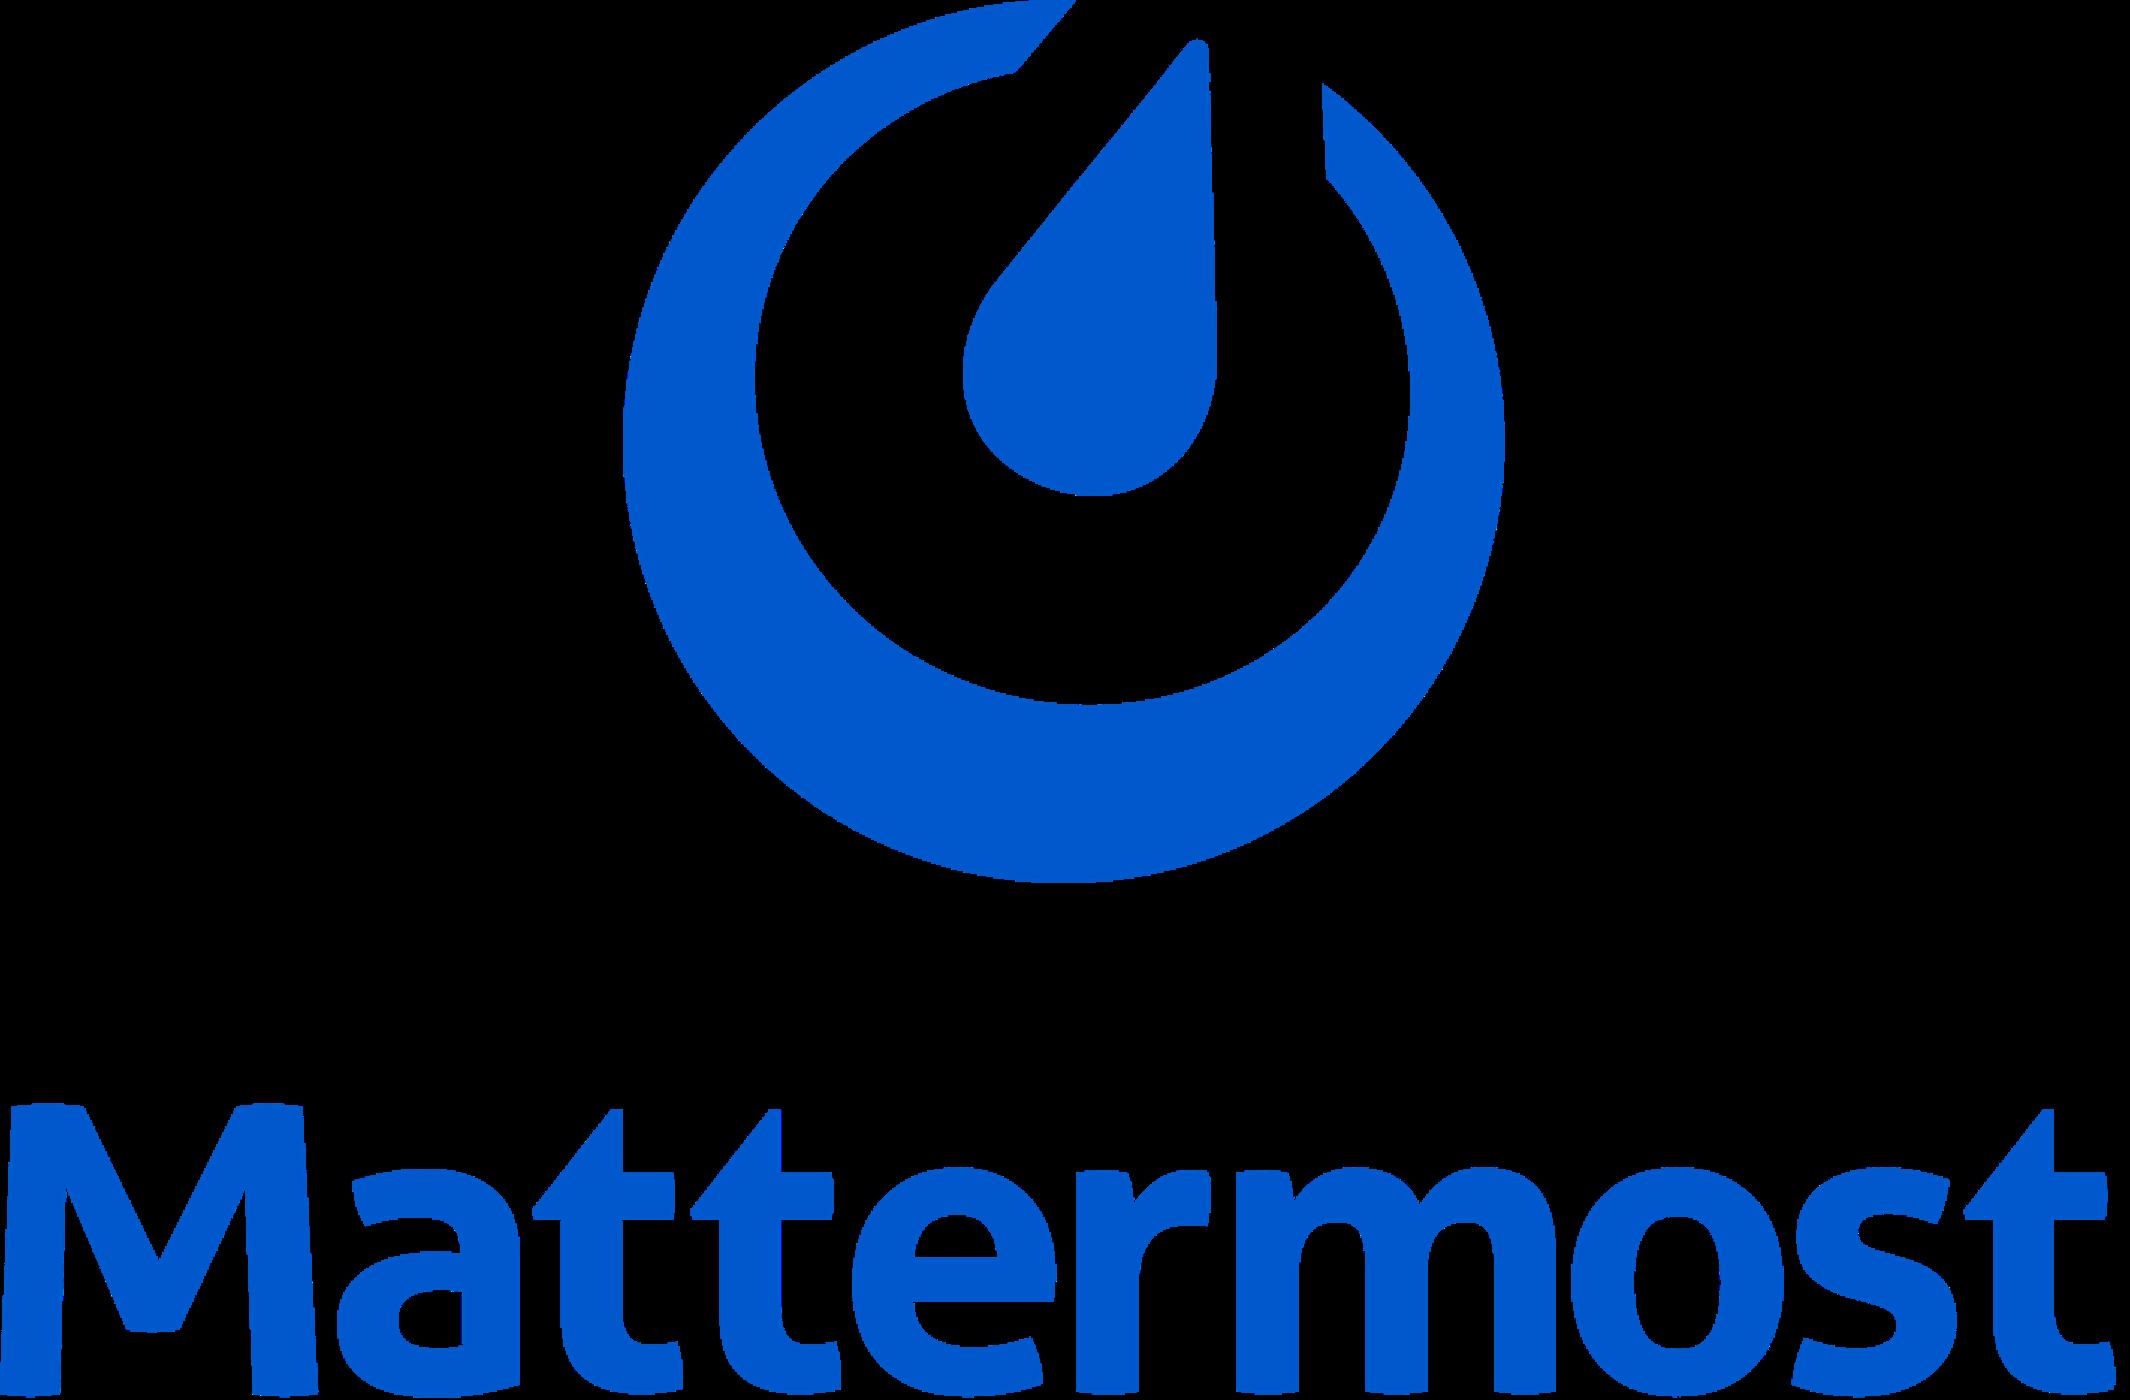 Mattermost.com logo